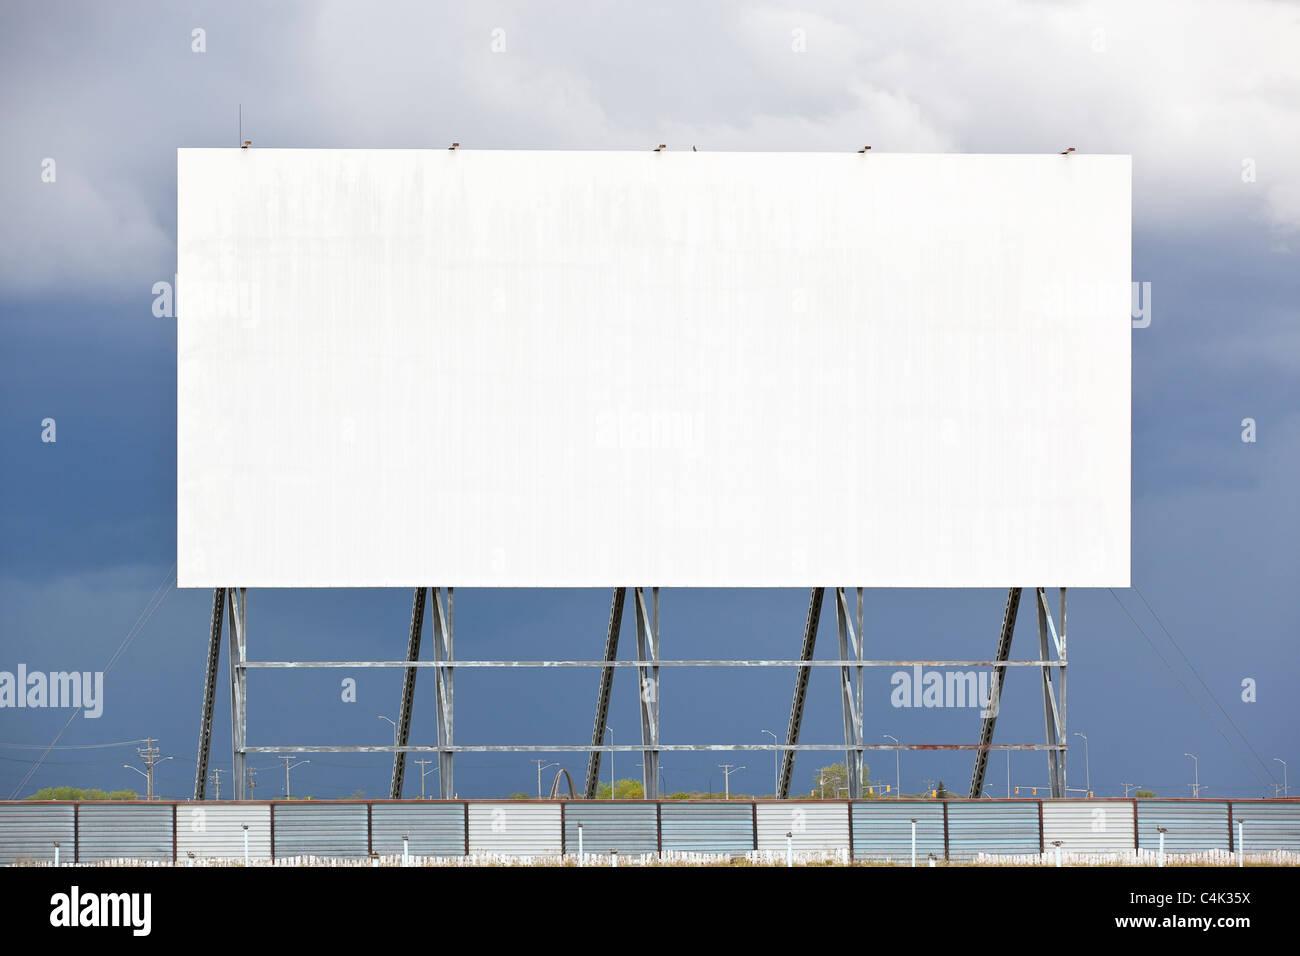 Im freien Drive-in-Kino.  Winnipeg, Manitoba, Kanada. Stockbild